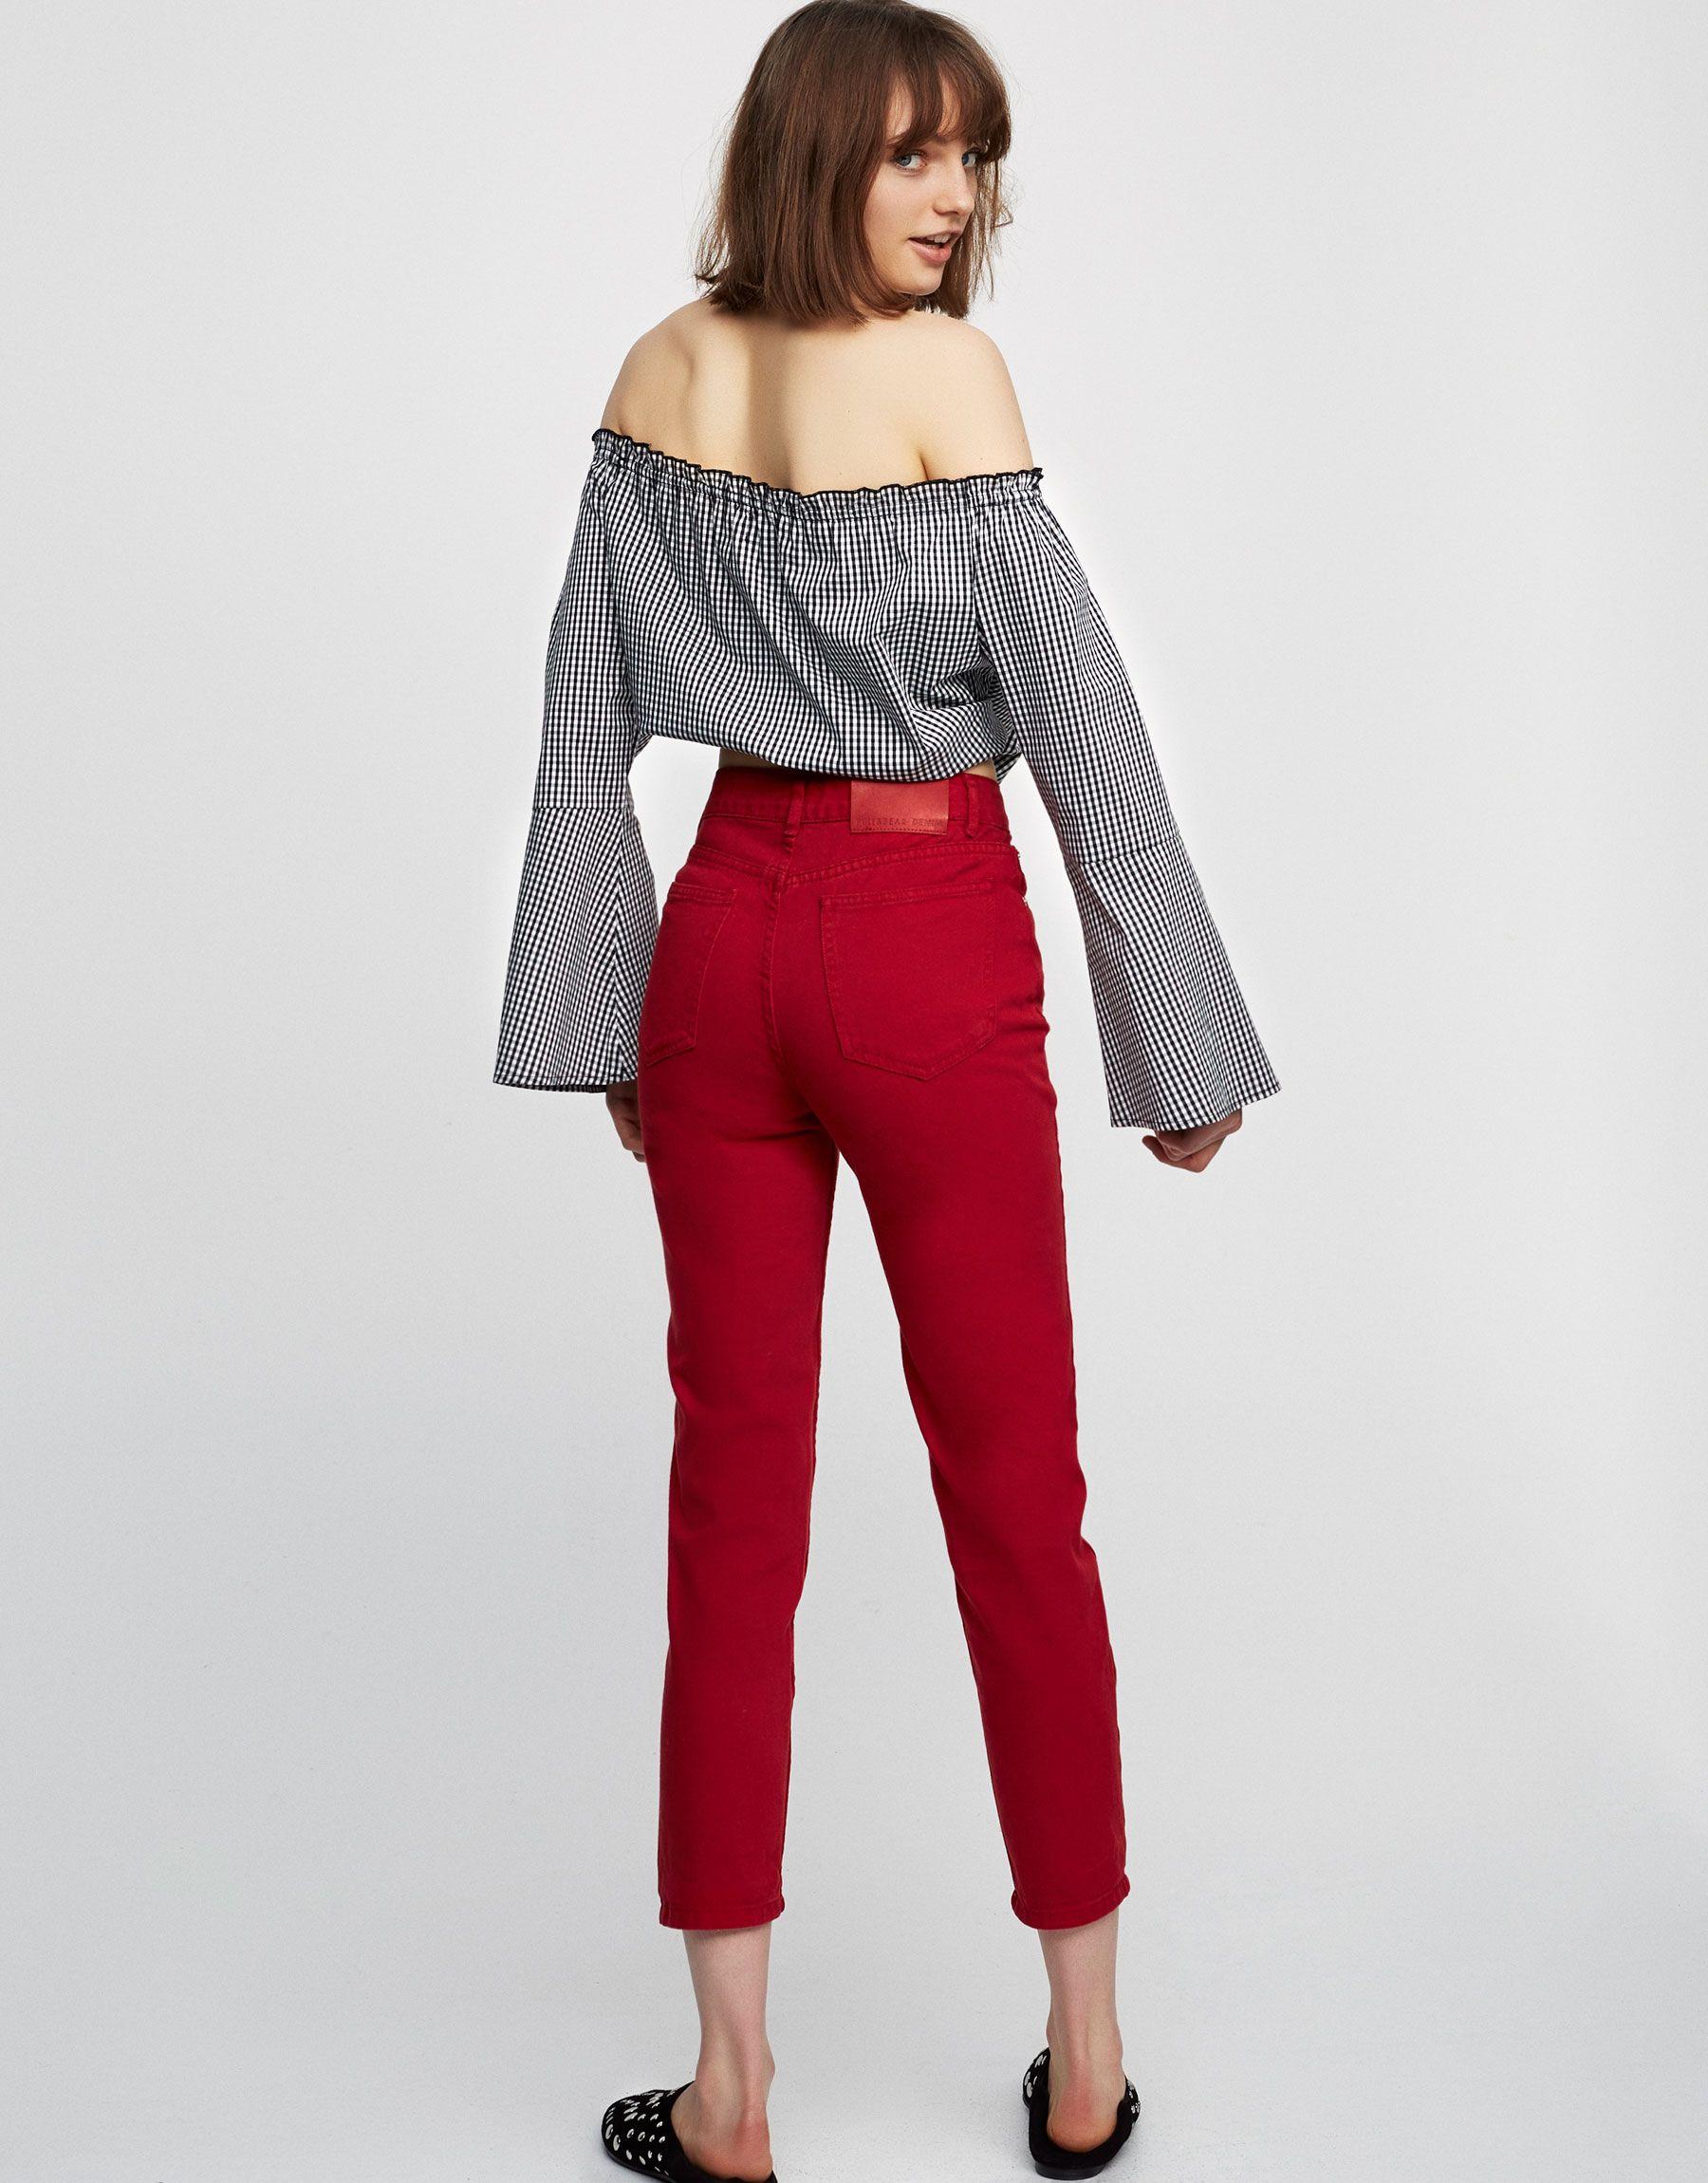 fe4764a923115 Cuerpo crop manga campana - Blusas y camisas - Ropa - Mujer - PULL BEAR  España